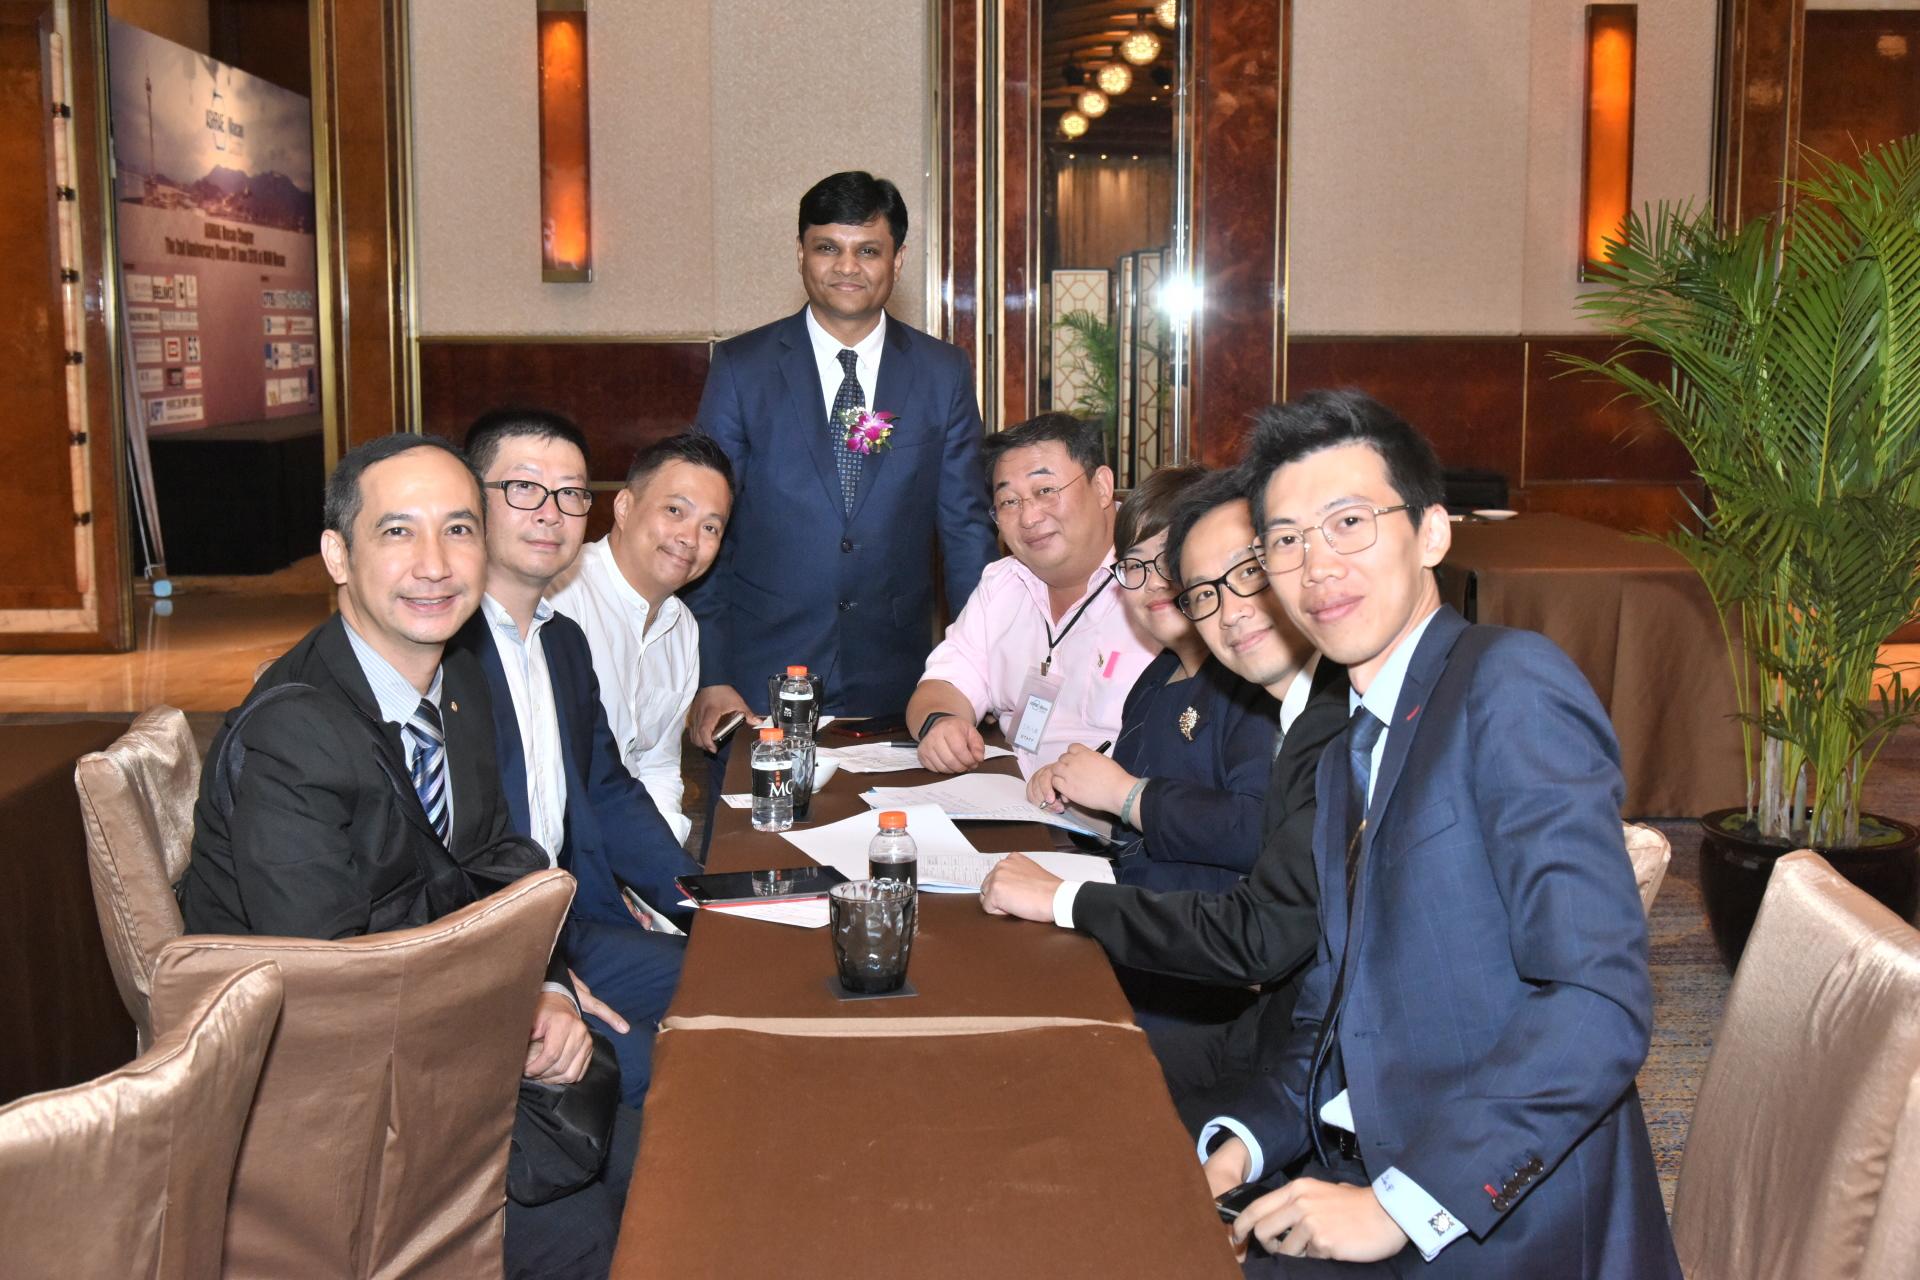 ASHRAE-Macao 2nd Annual General Meeting